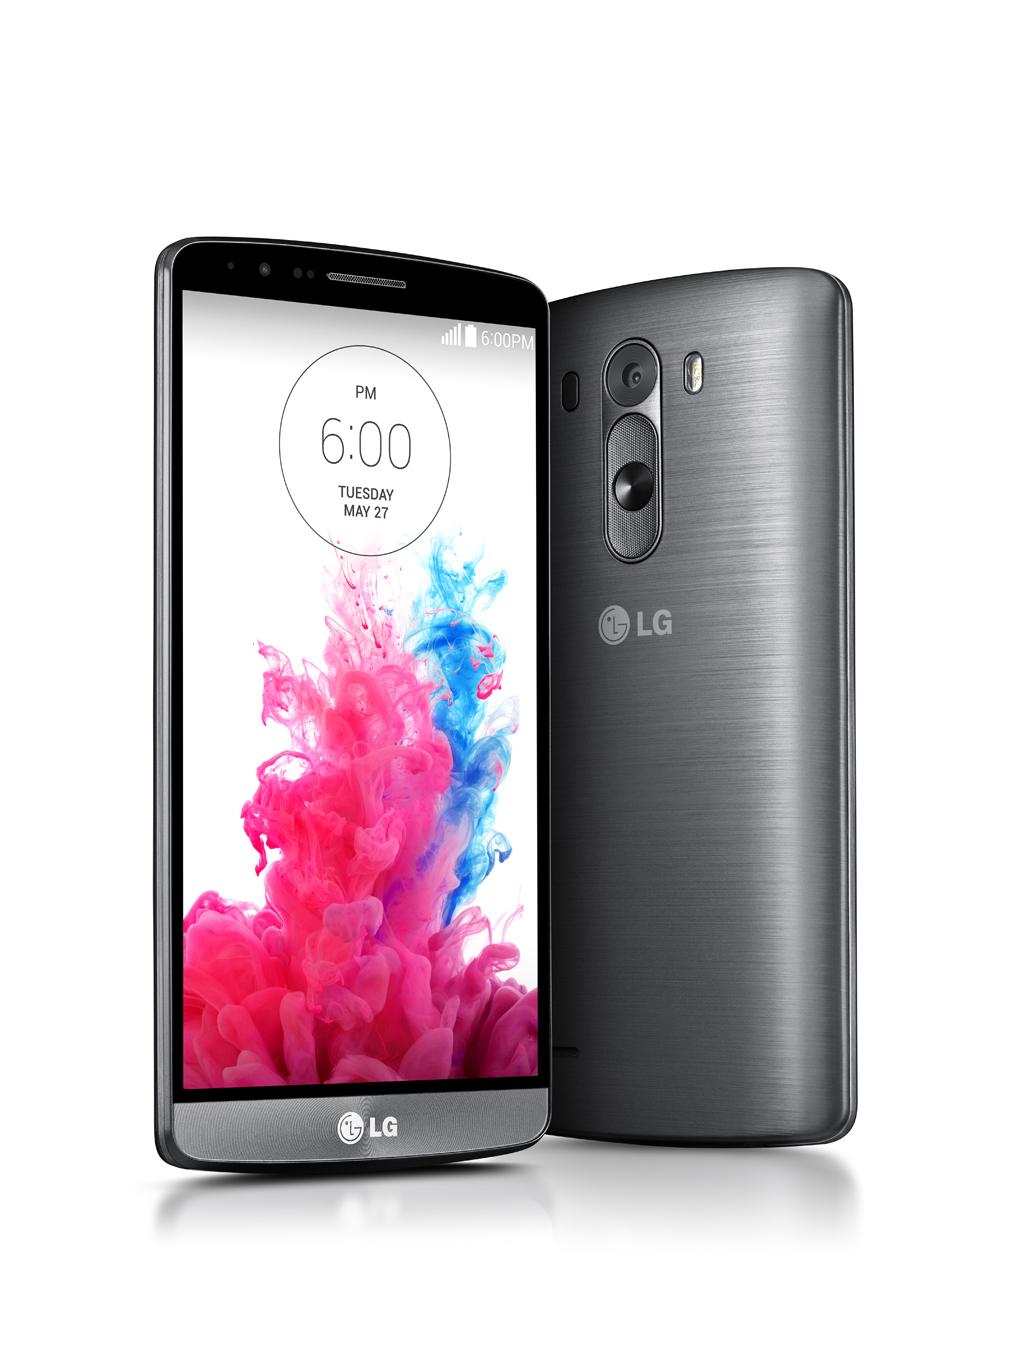 lg_g3-official_2